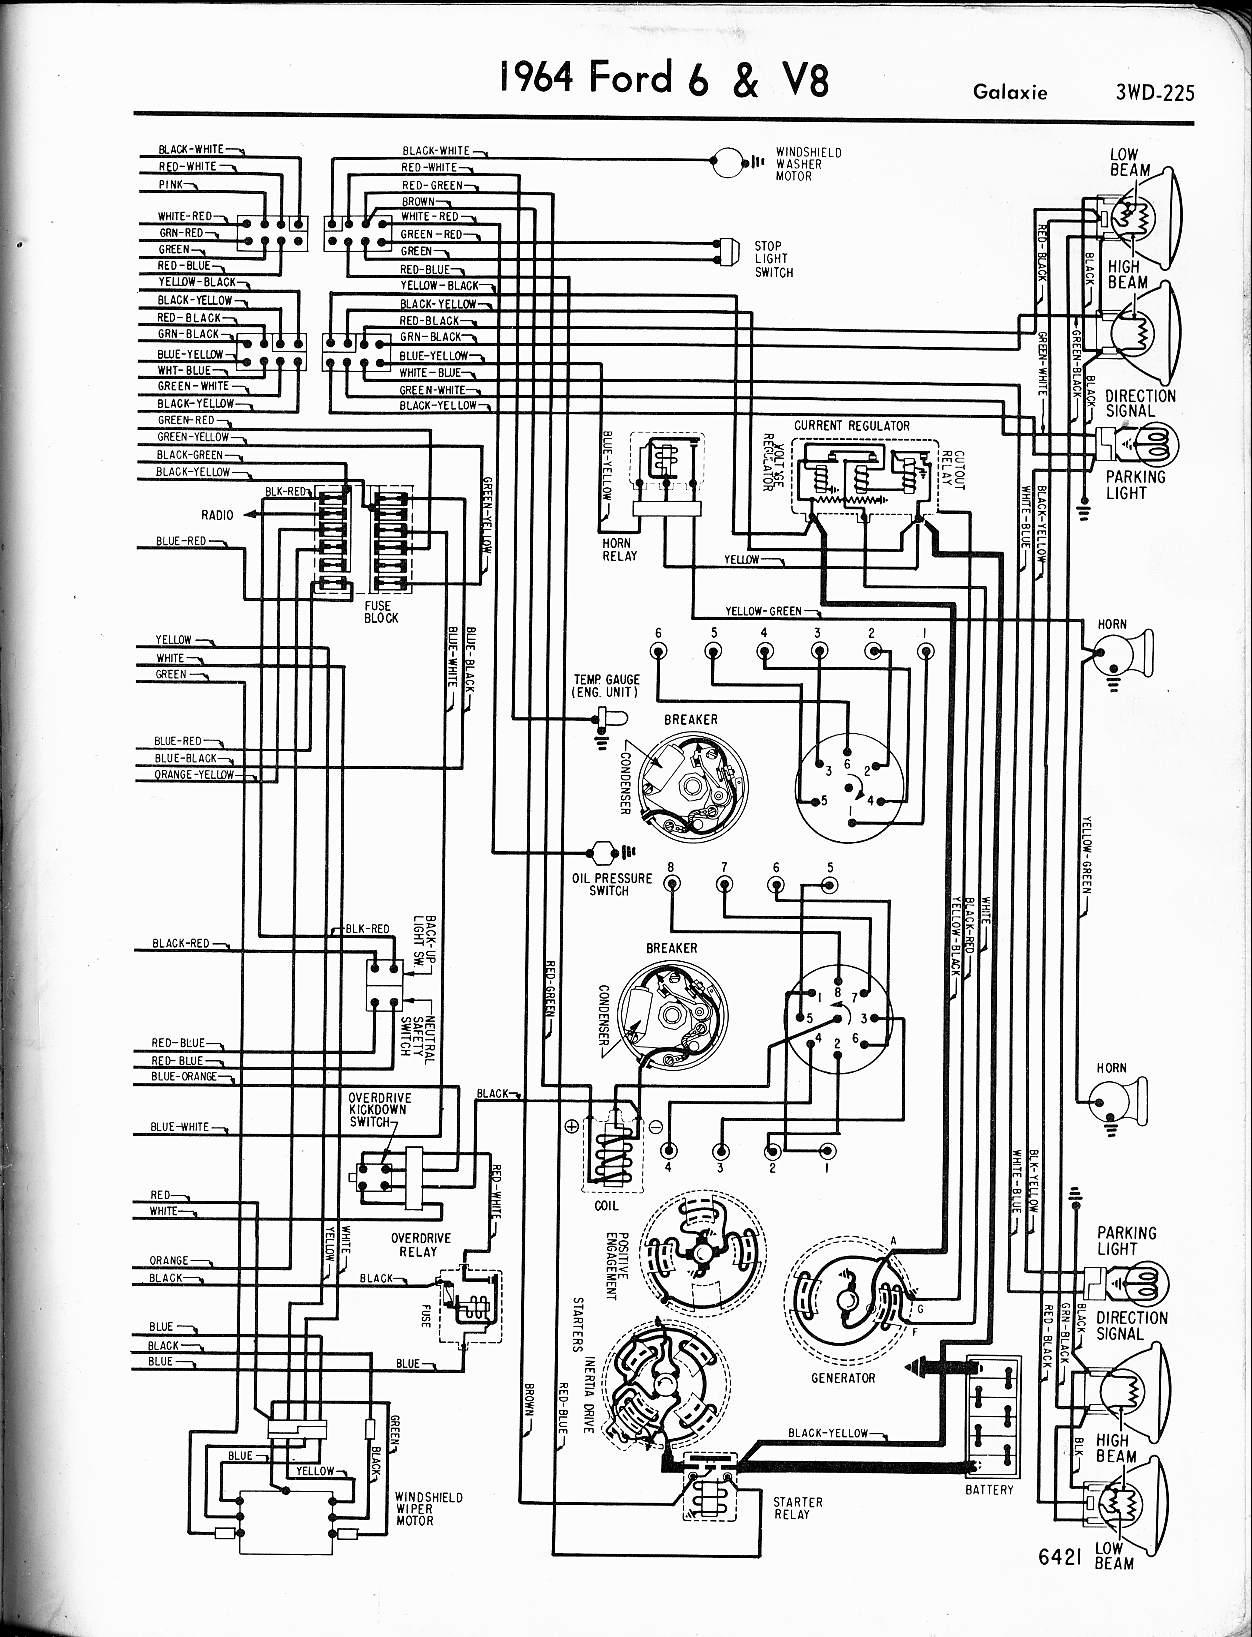 1966 ford ltd wiring diagram - wiring diagrams cute-script -  cute-script.mumblestudio.it  mumblestudio.it